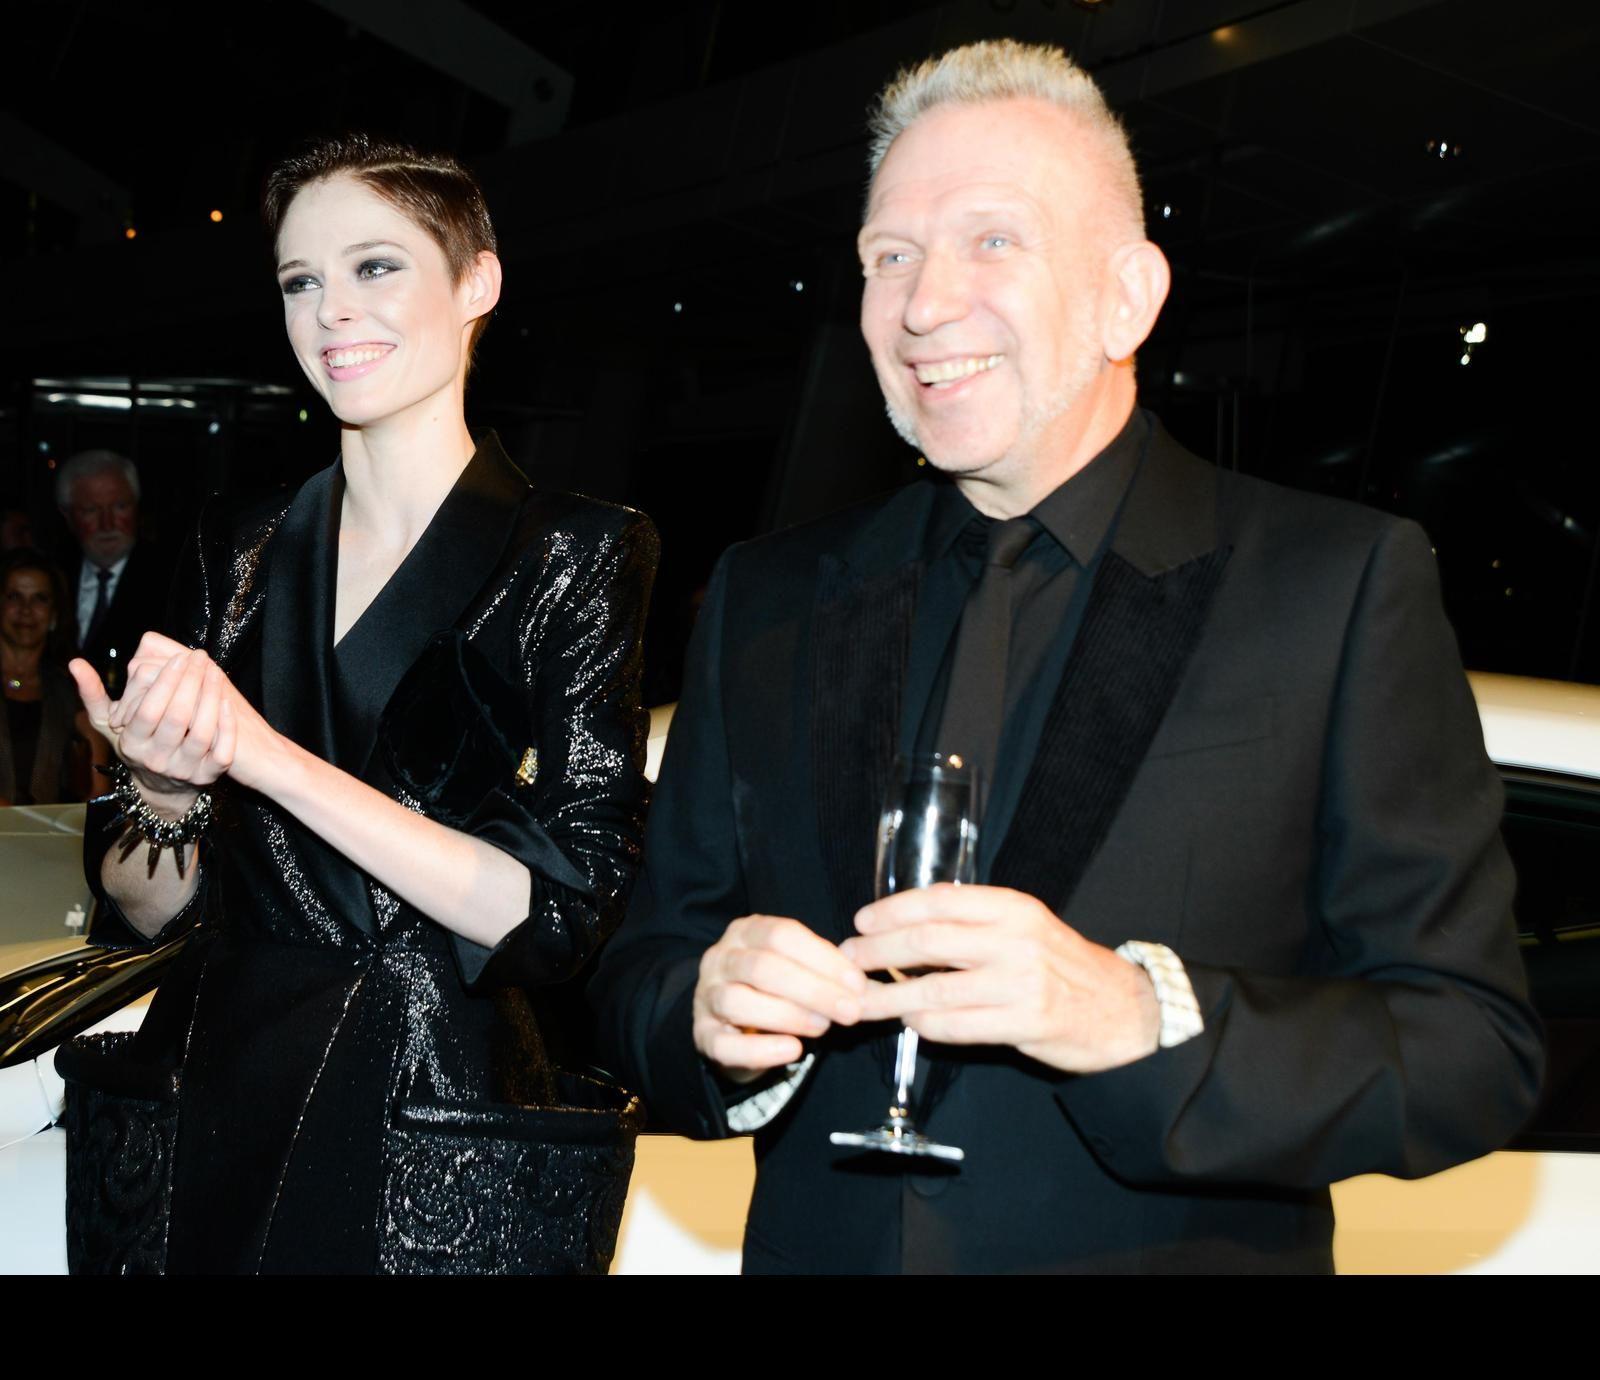 Coca Rocha & Jean Paul Gaultier